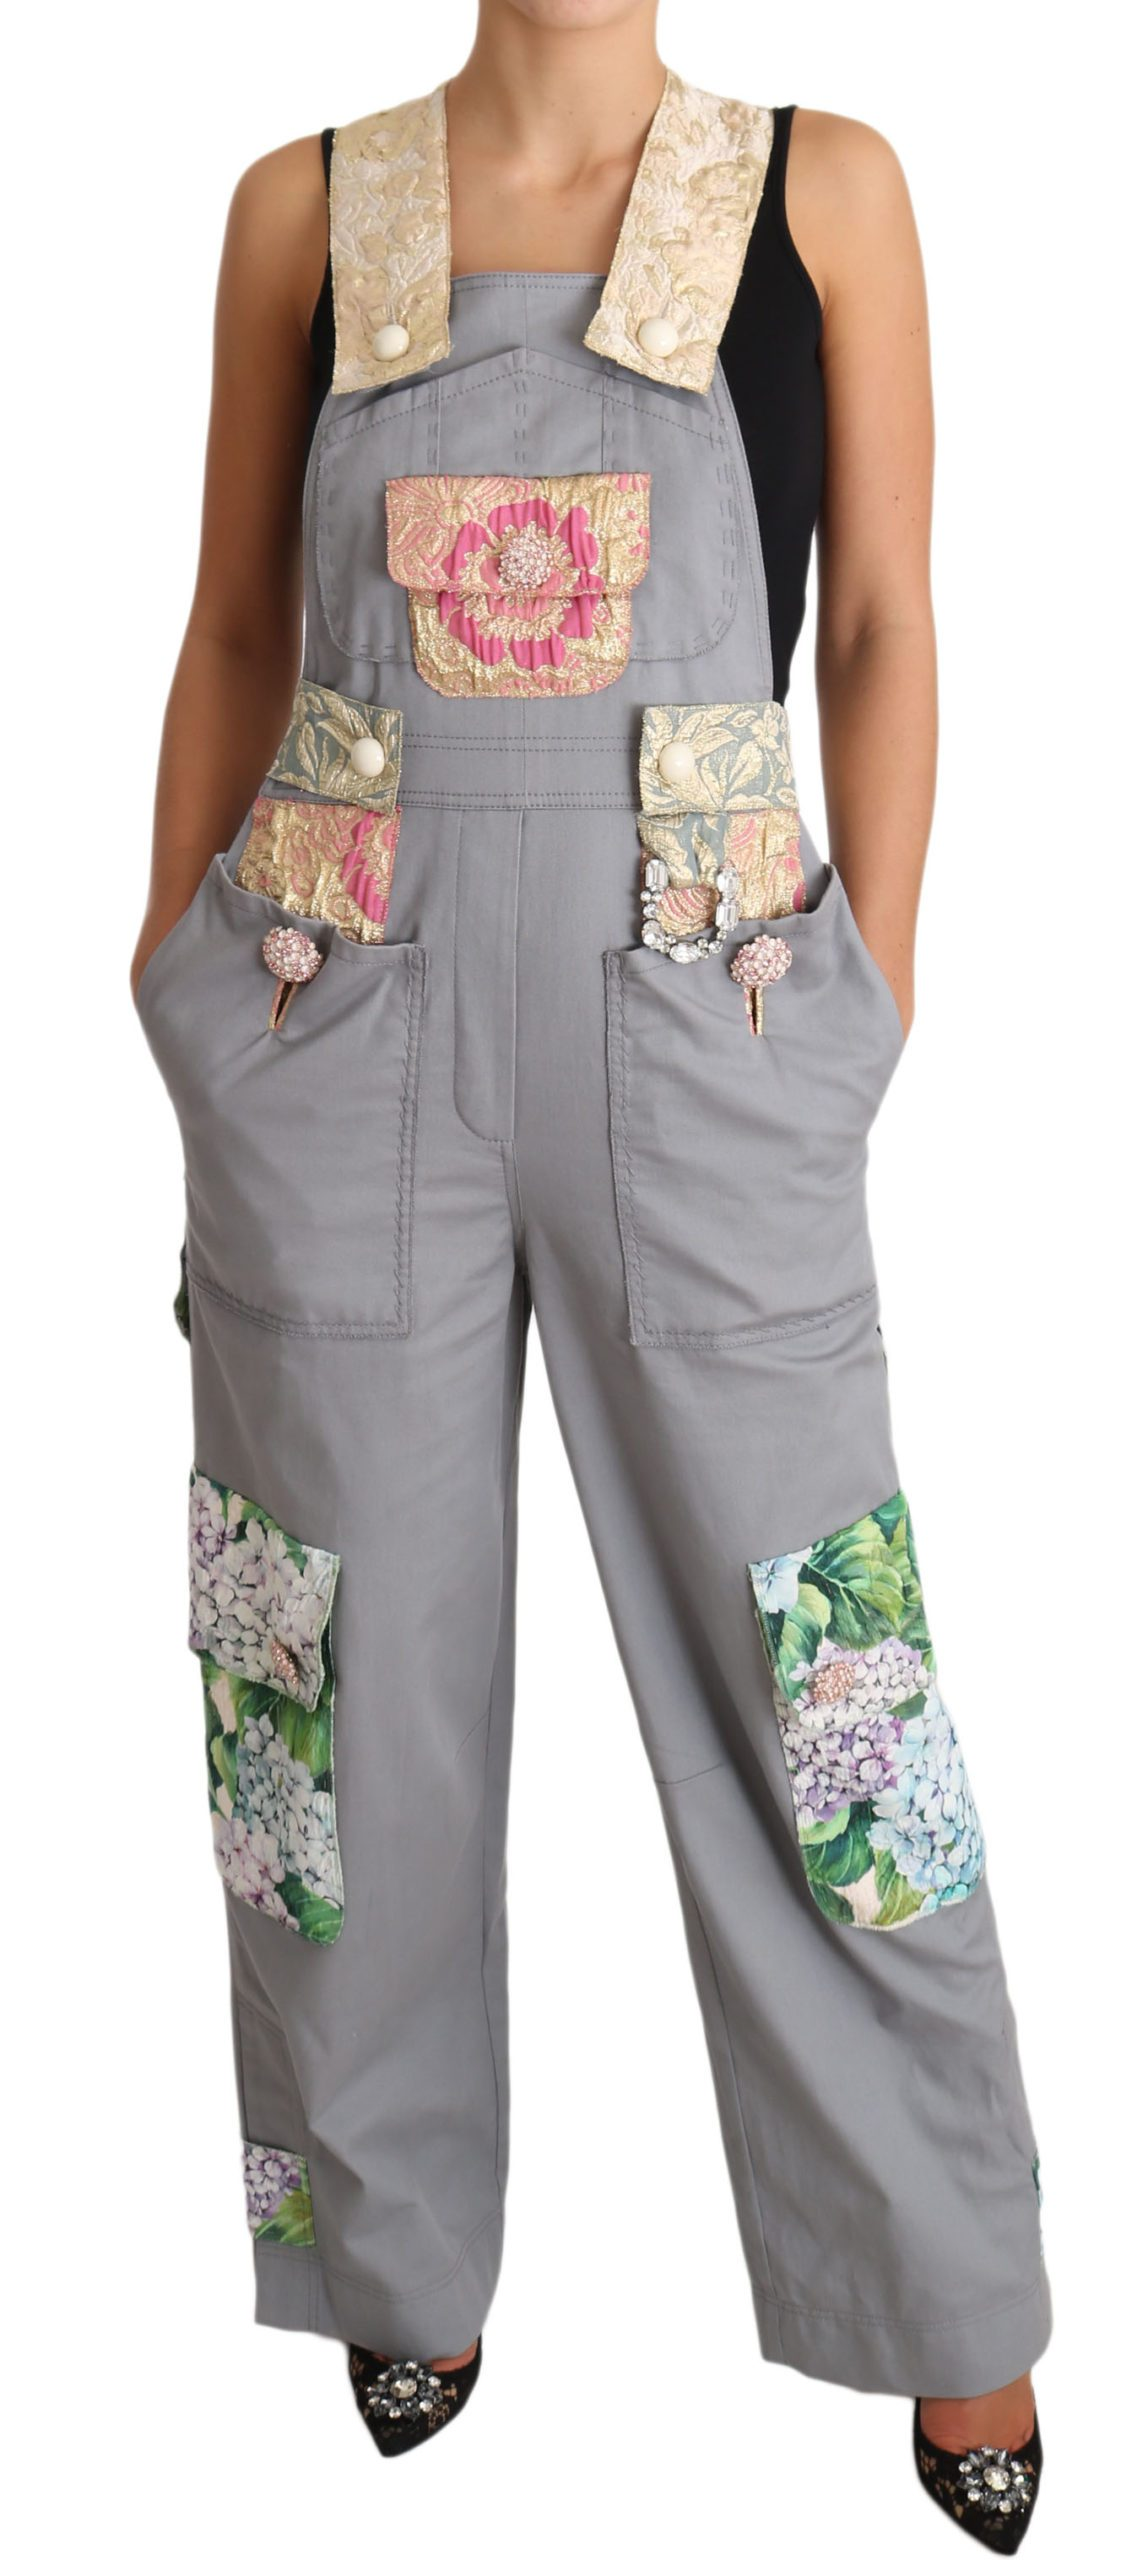 Dolce & Gabbana Women's Overall Denim Crystal Hortensia Jeans Pink TSH3407 - IT40 S